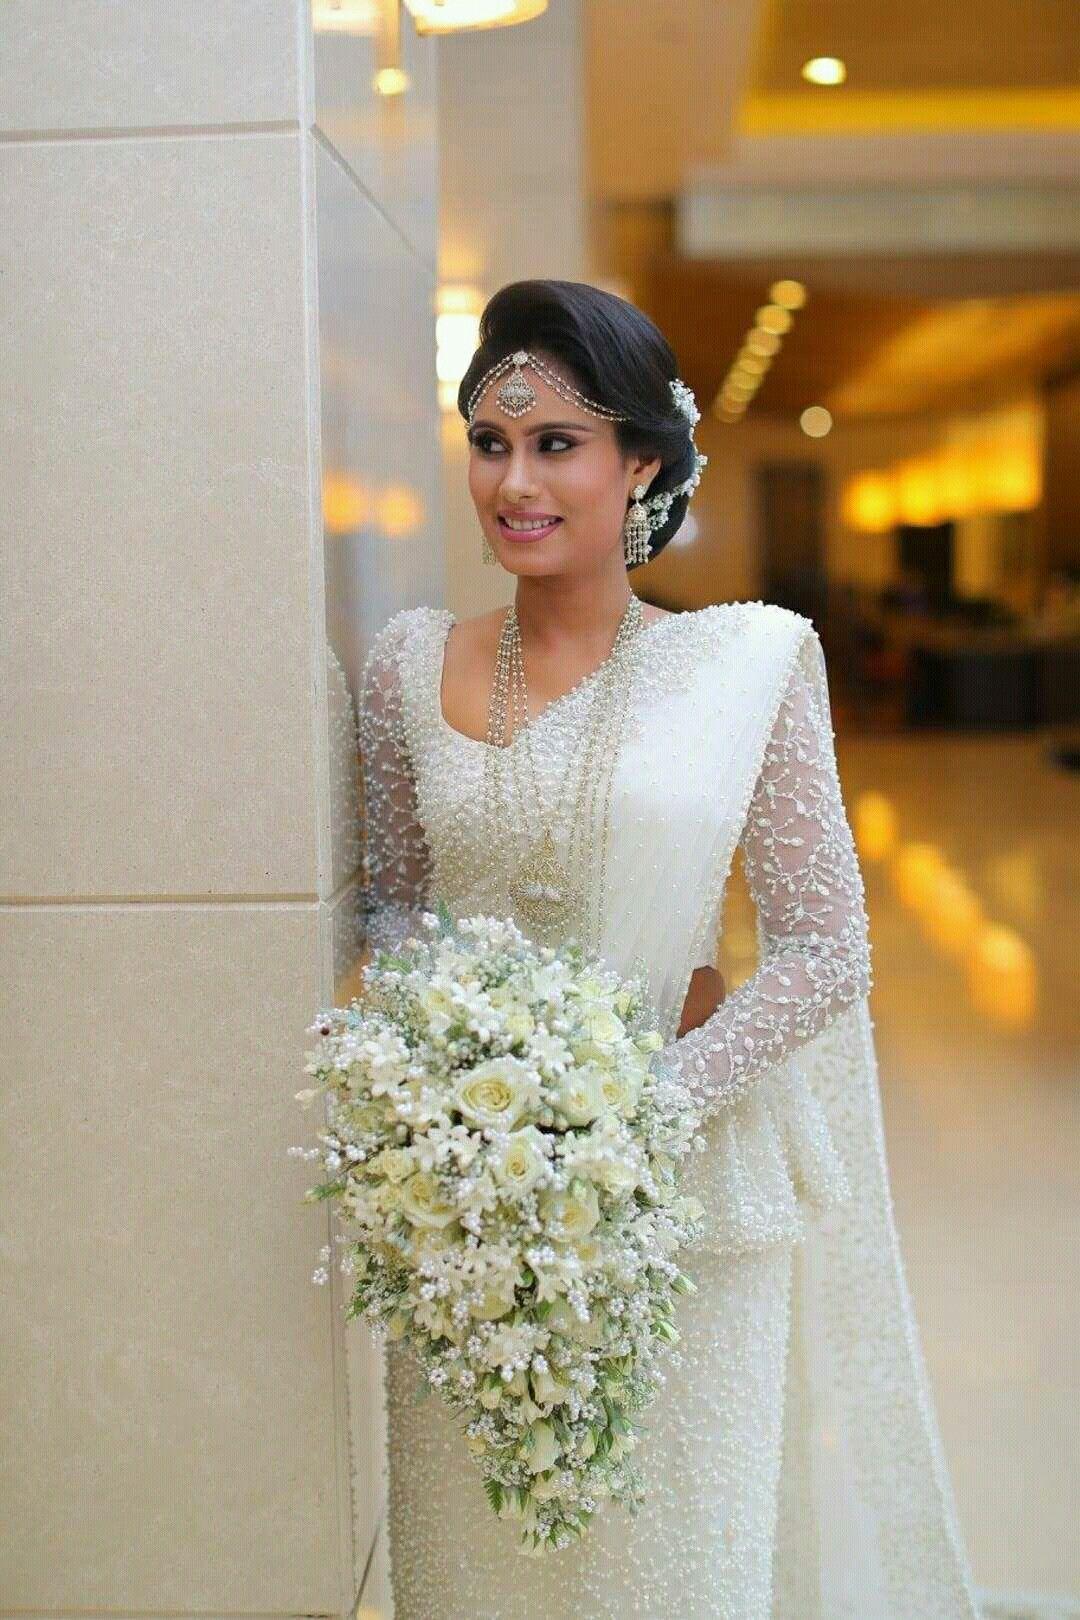 Dressed Dhananjaya Bandara | Happy ❤❤ | Pinterest | Hochzeitskleider